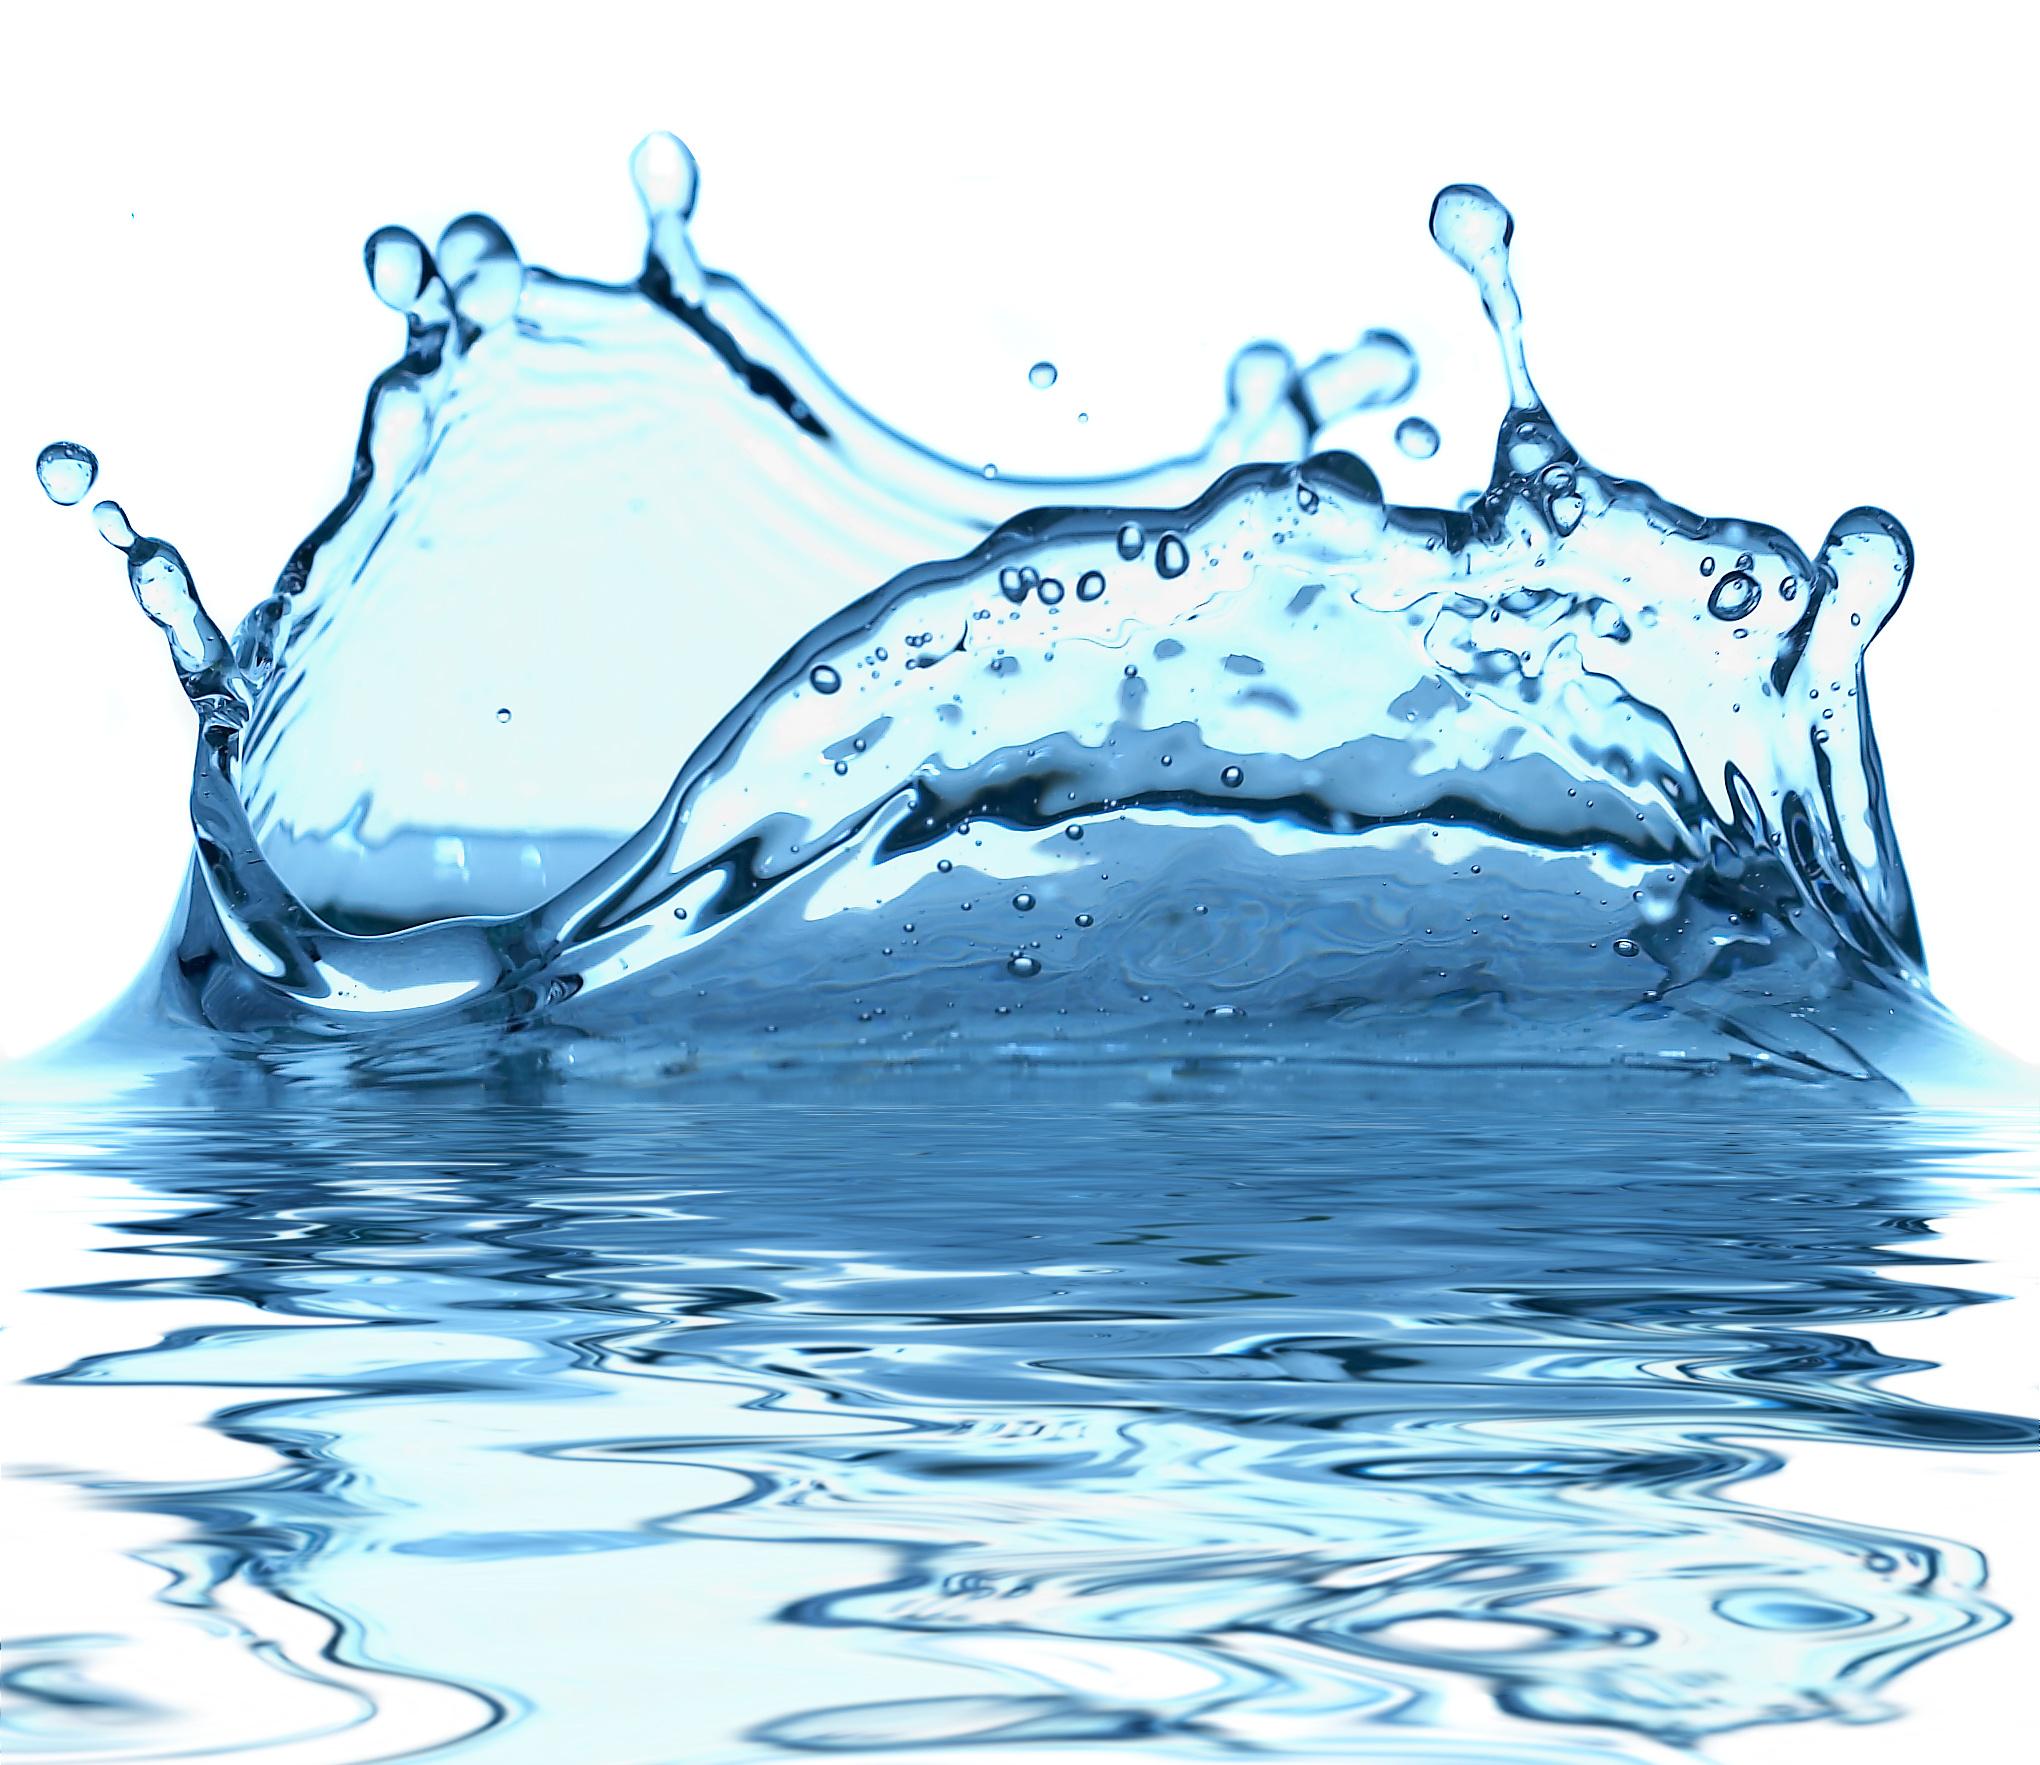 Water drops PNG image